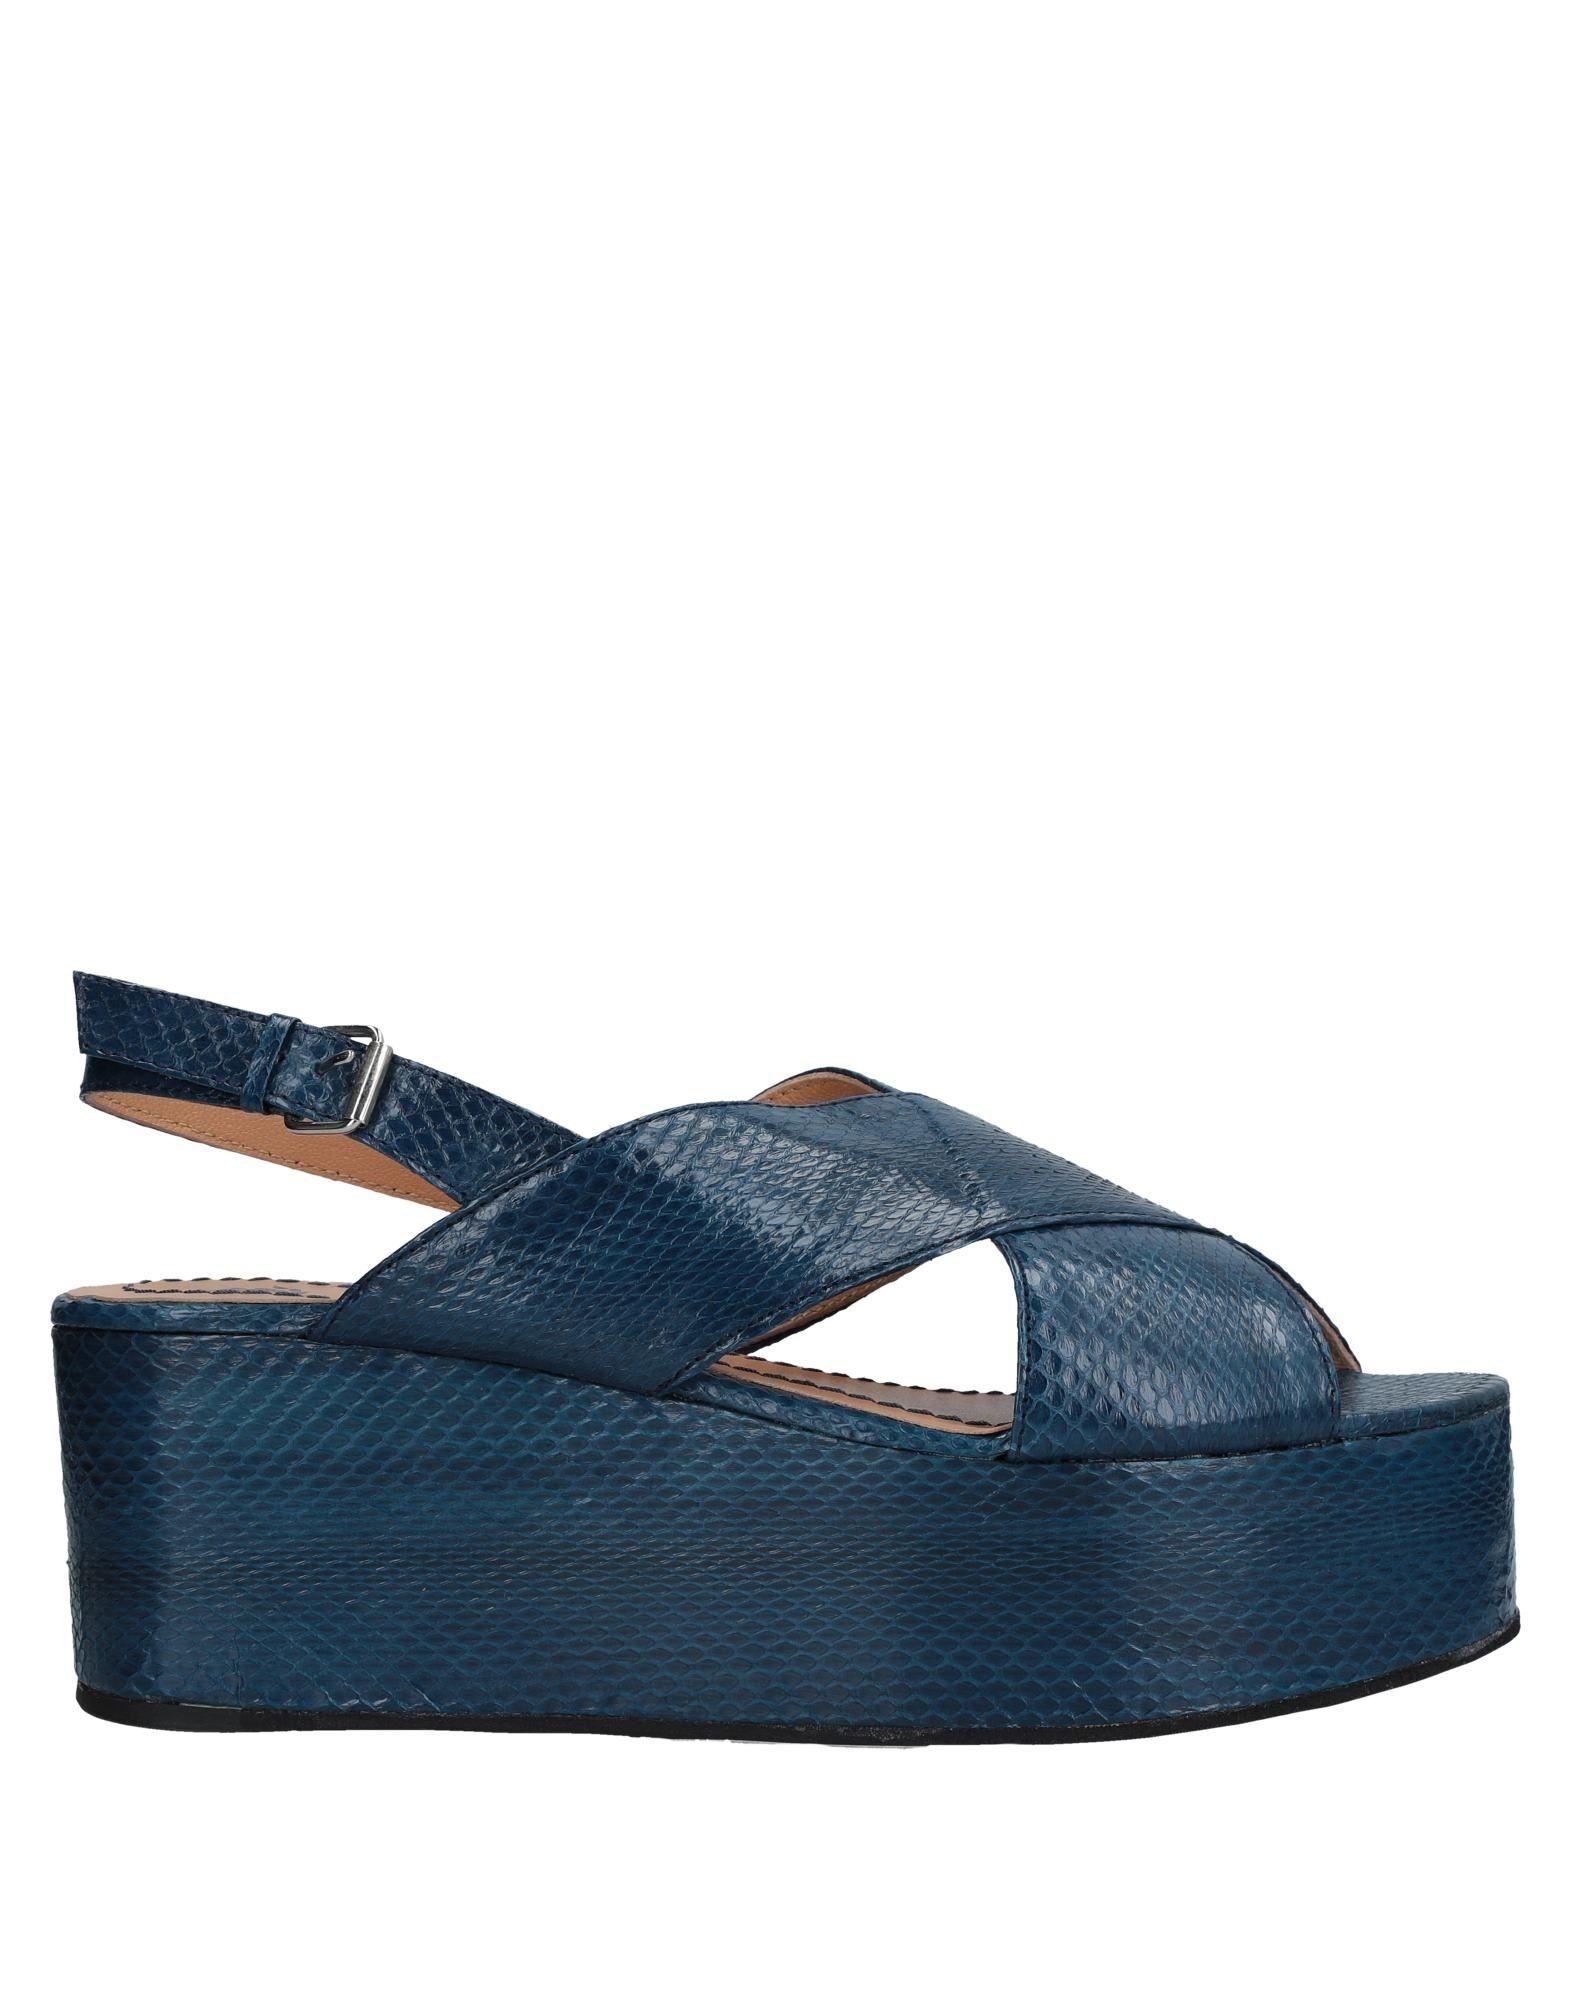 Malìparmi Sandalen Damen  11534126UX Gute Qualität beliebte Schuhe